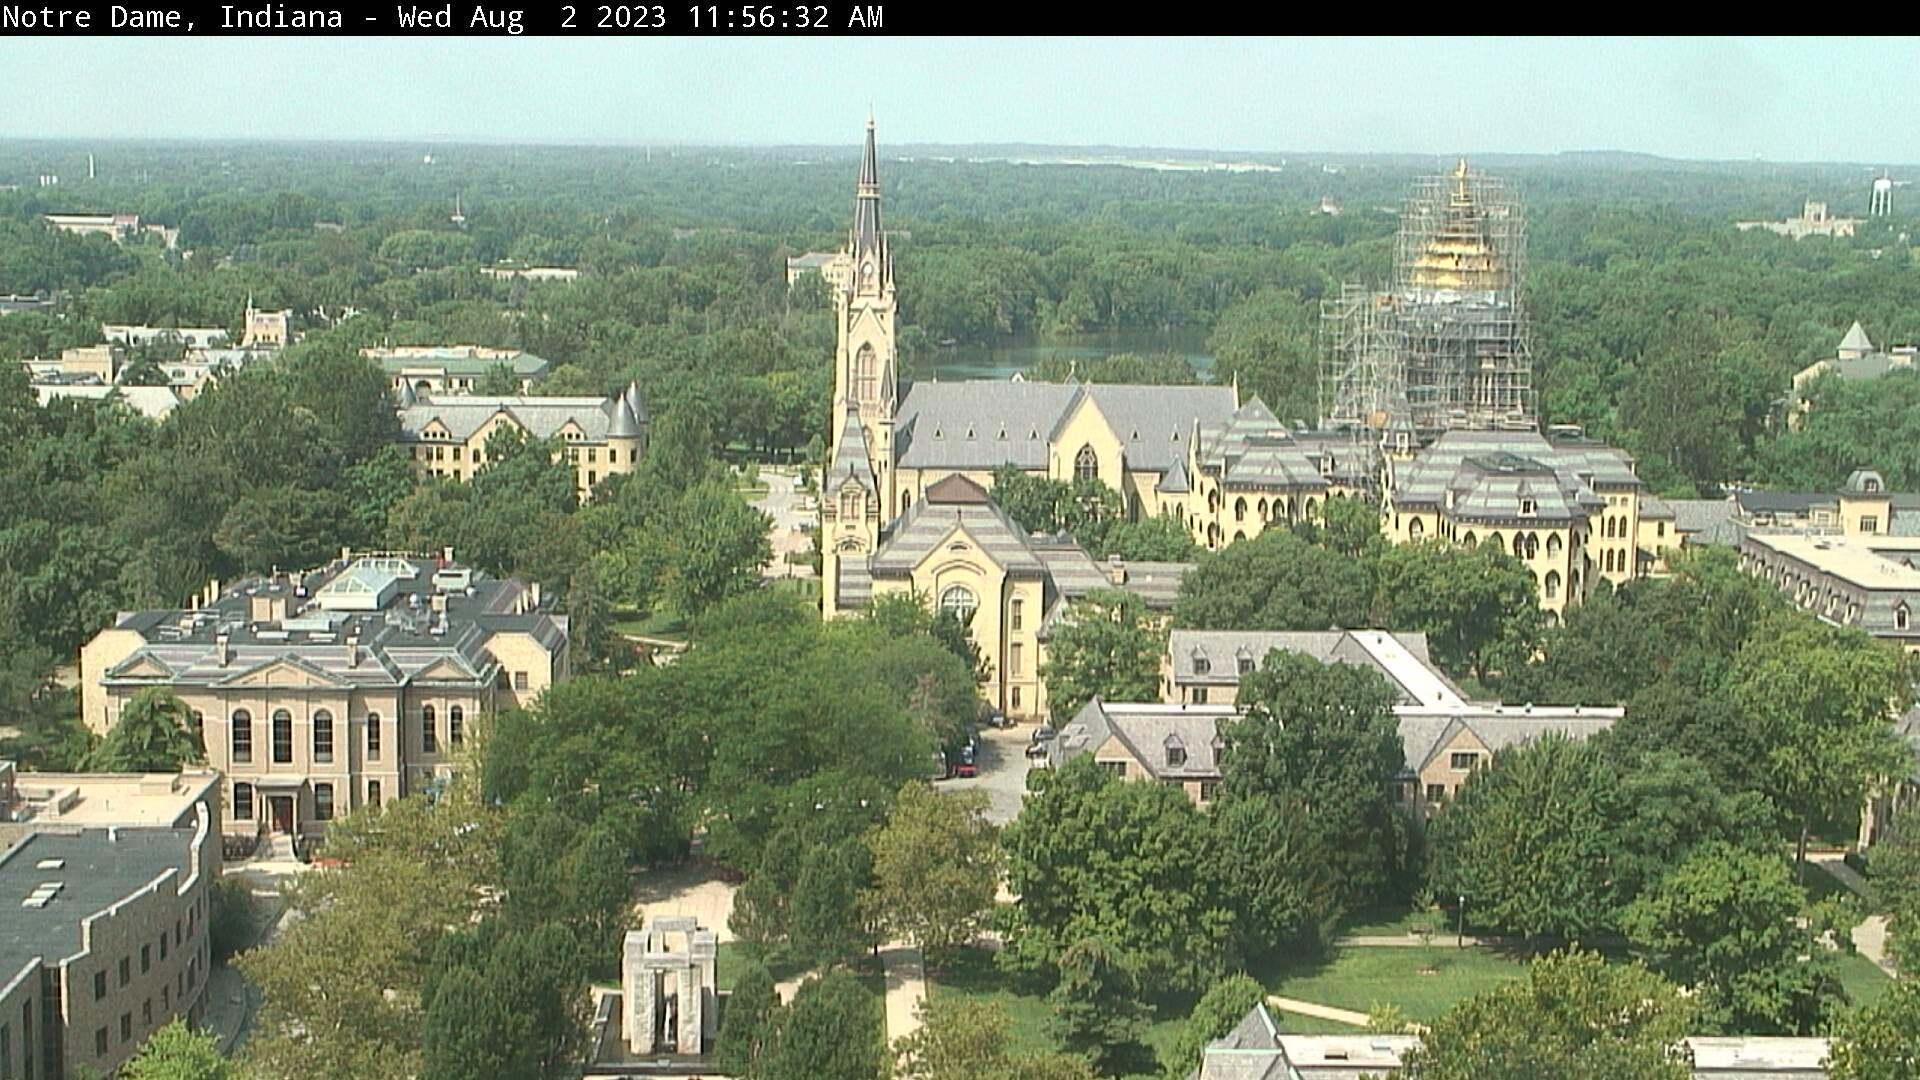 Notre Dame, Indiana Sat. 11:56